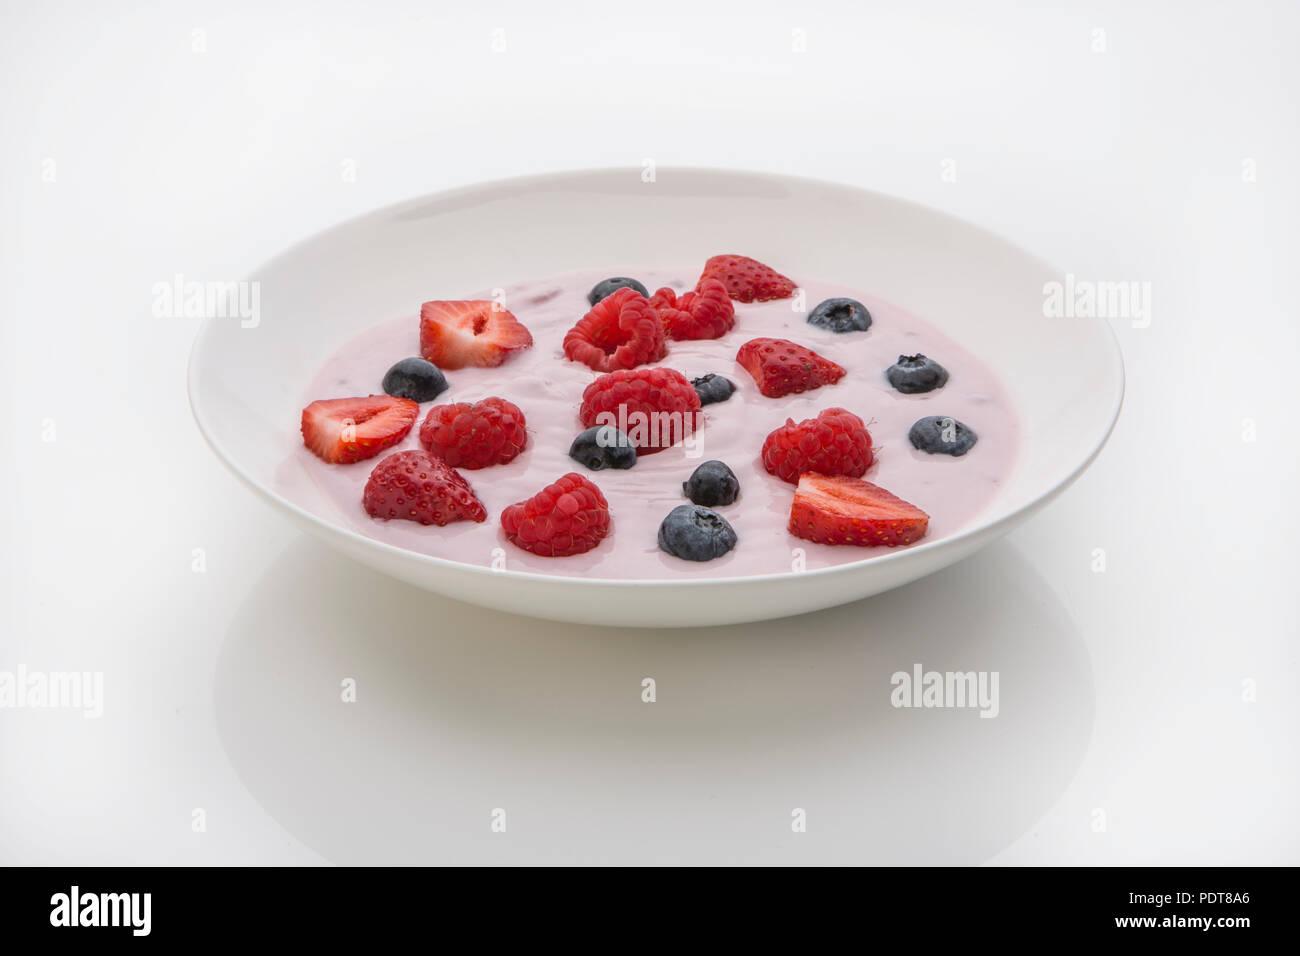 Fresh fruit in yoghurt - Stock Image